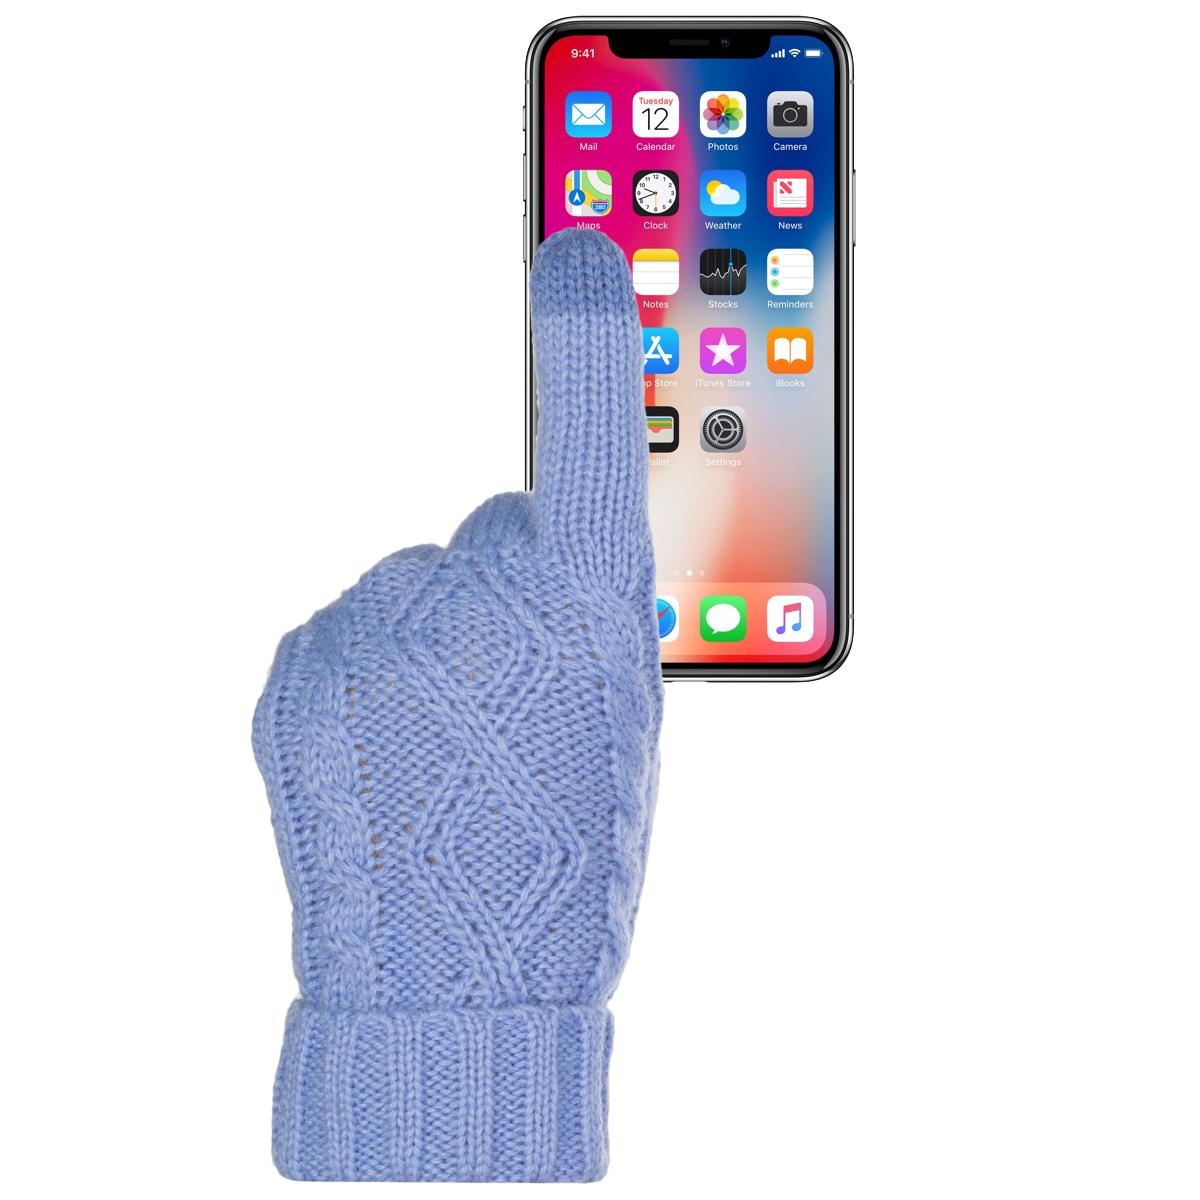 Warm-Cute-Texting-Gloves-Touch-Screen-Gloves-Knit-Gloves-Winter-Gloves-For-Women Indexbild 11